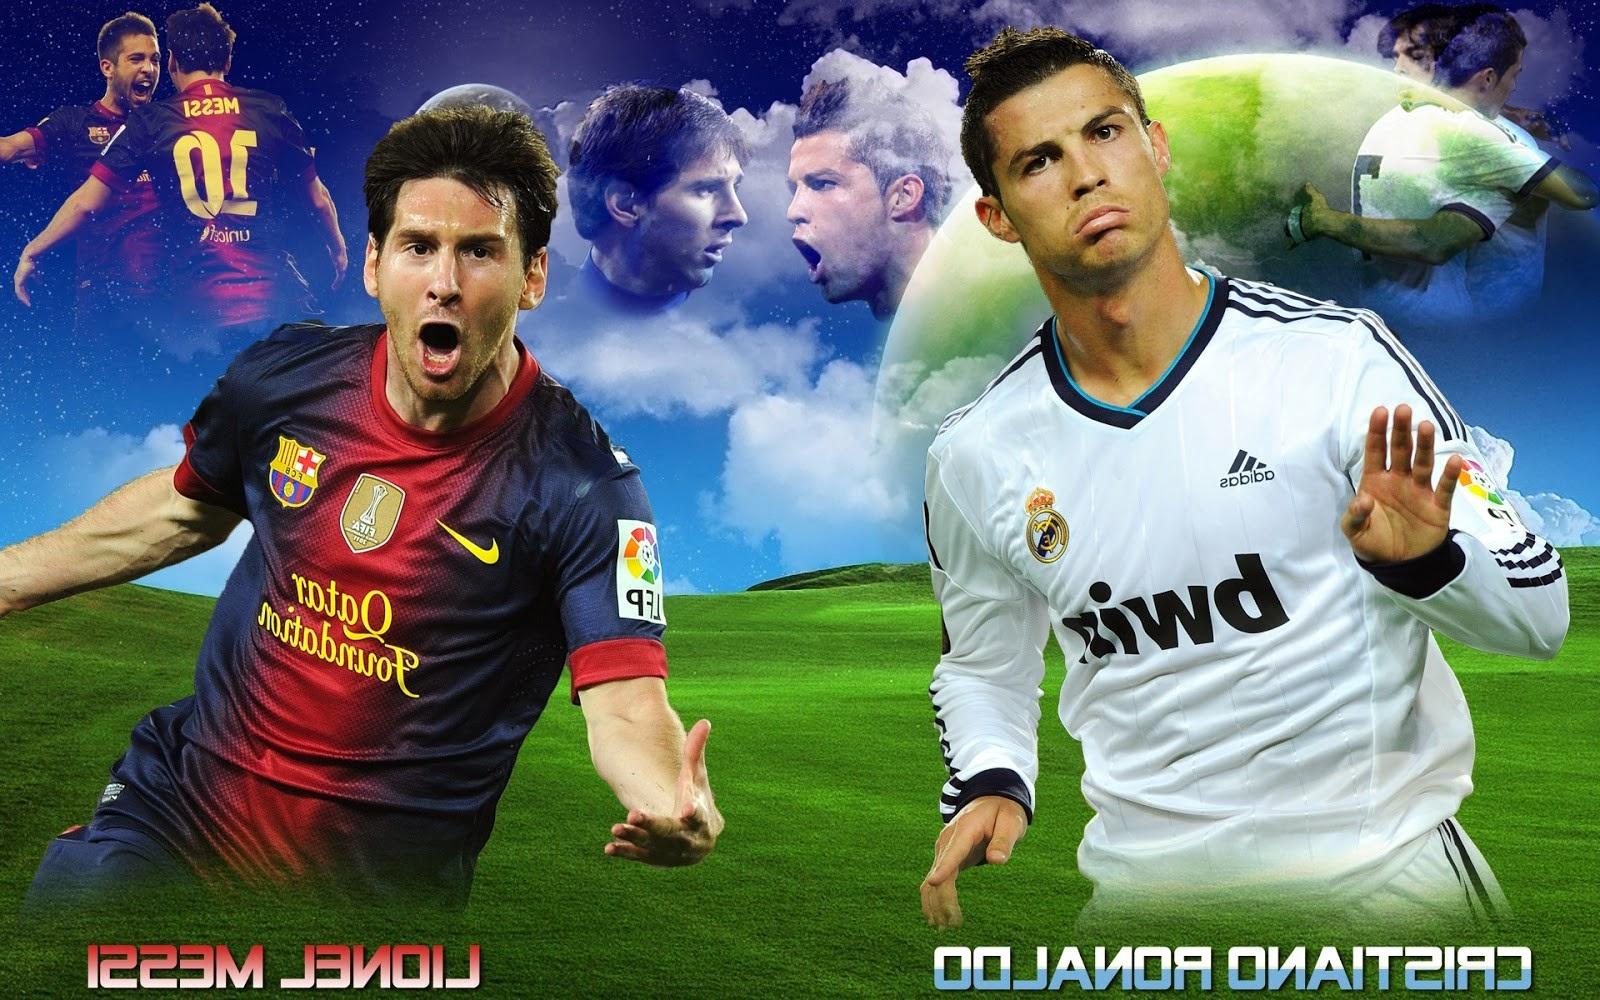 Ronaldo Vs Messi Wallpaper 2014 Ronaldo Vs Mess...